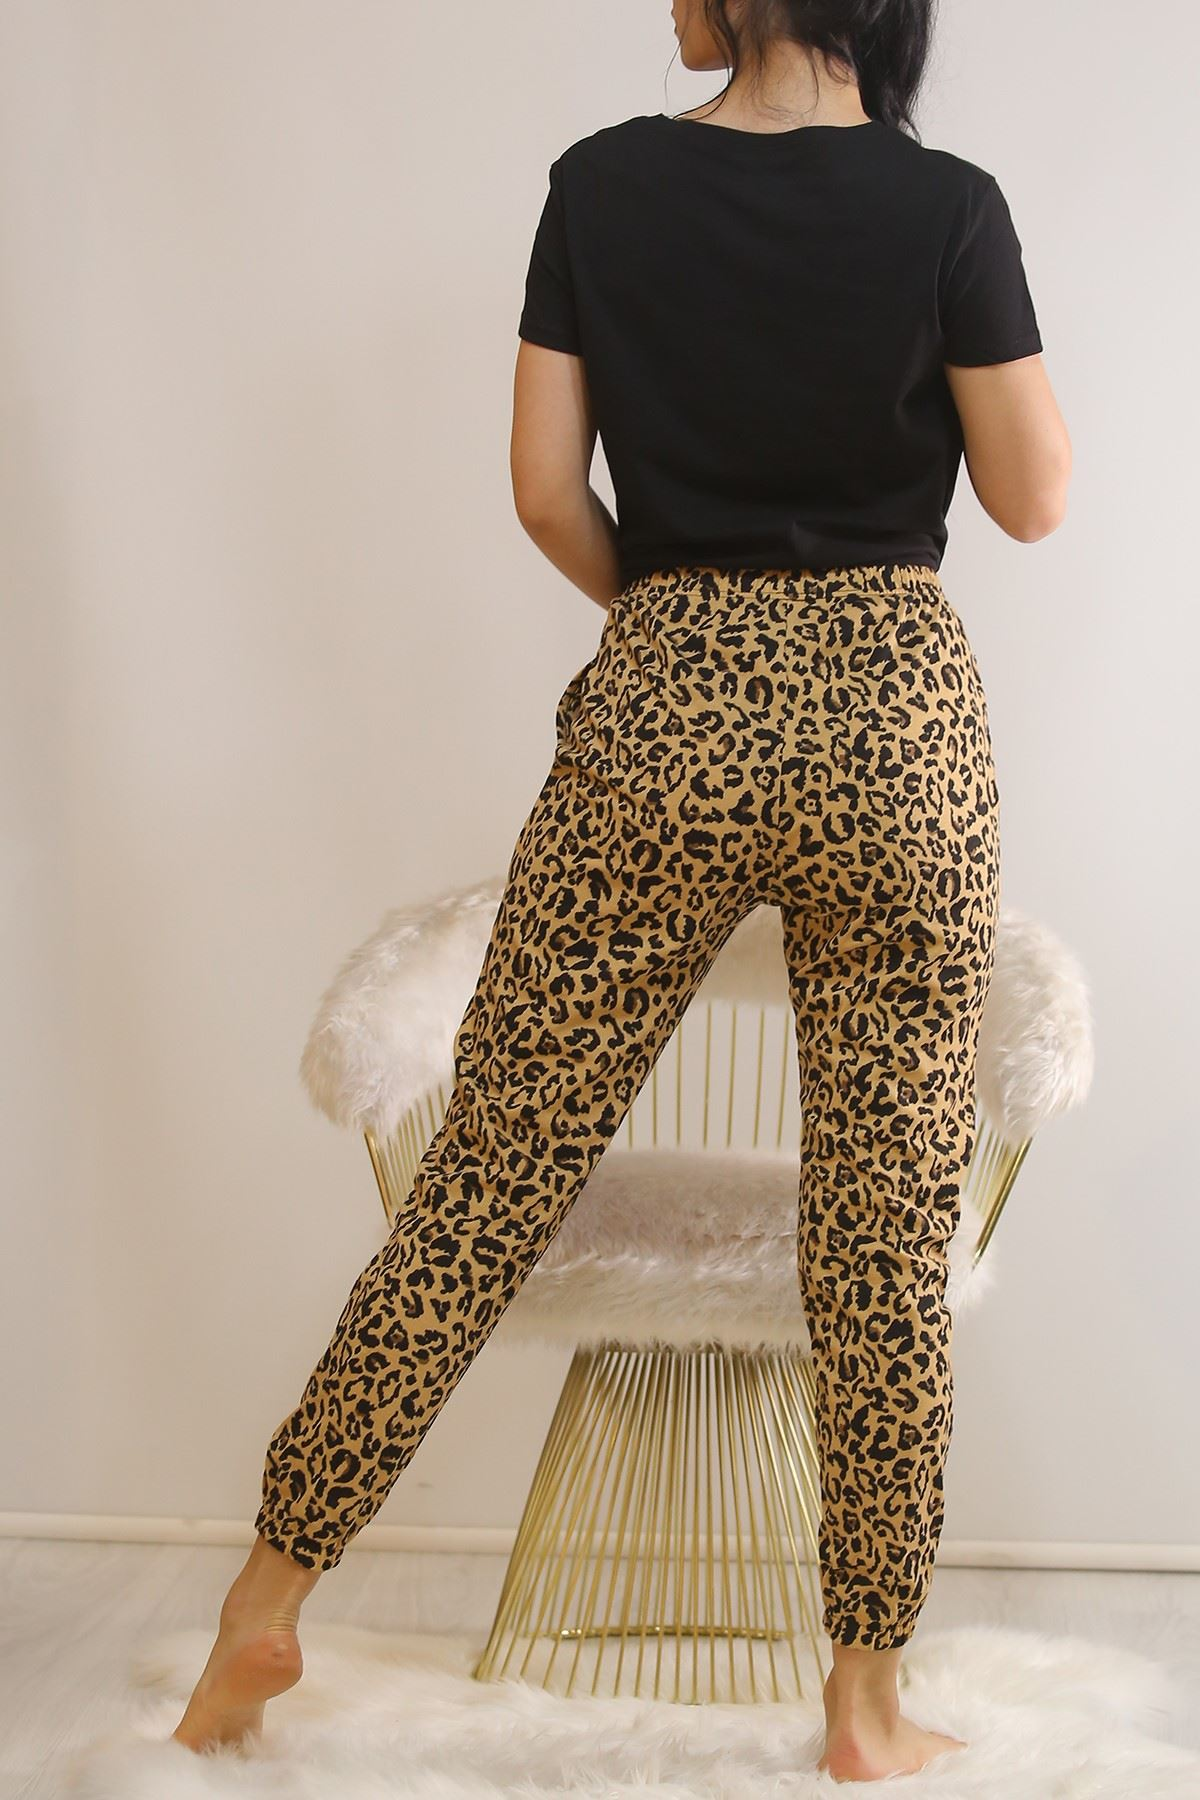 Bağlamalı Pijama Takımı Siyah - 5991.1059.